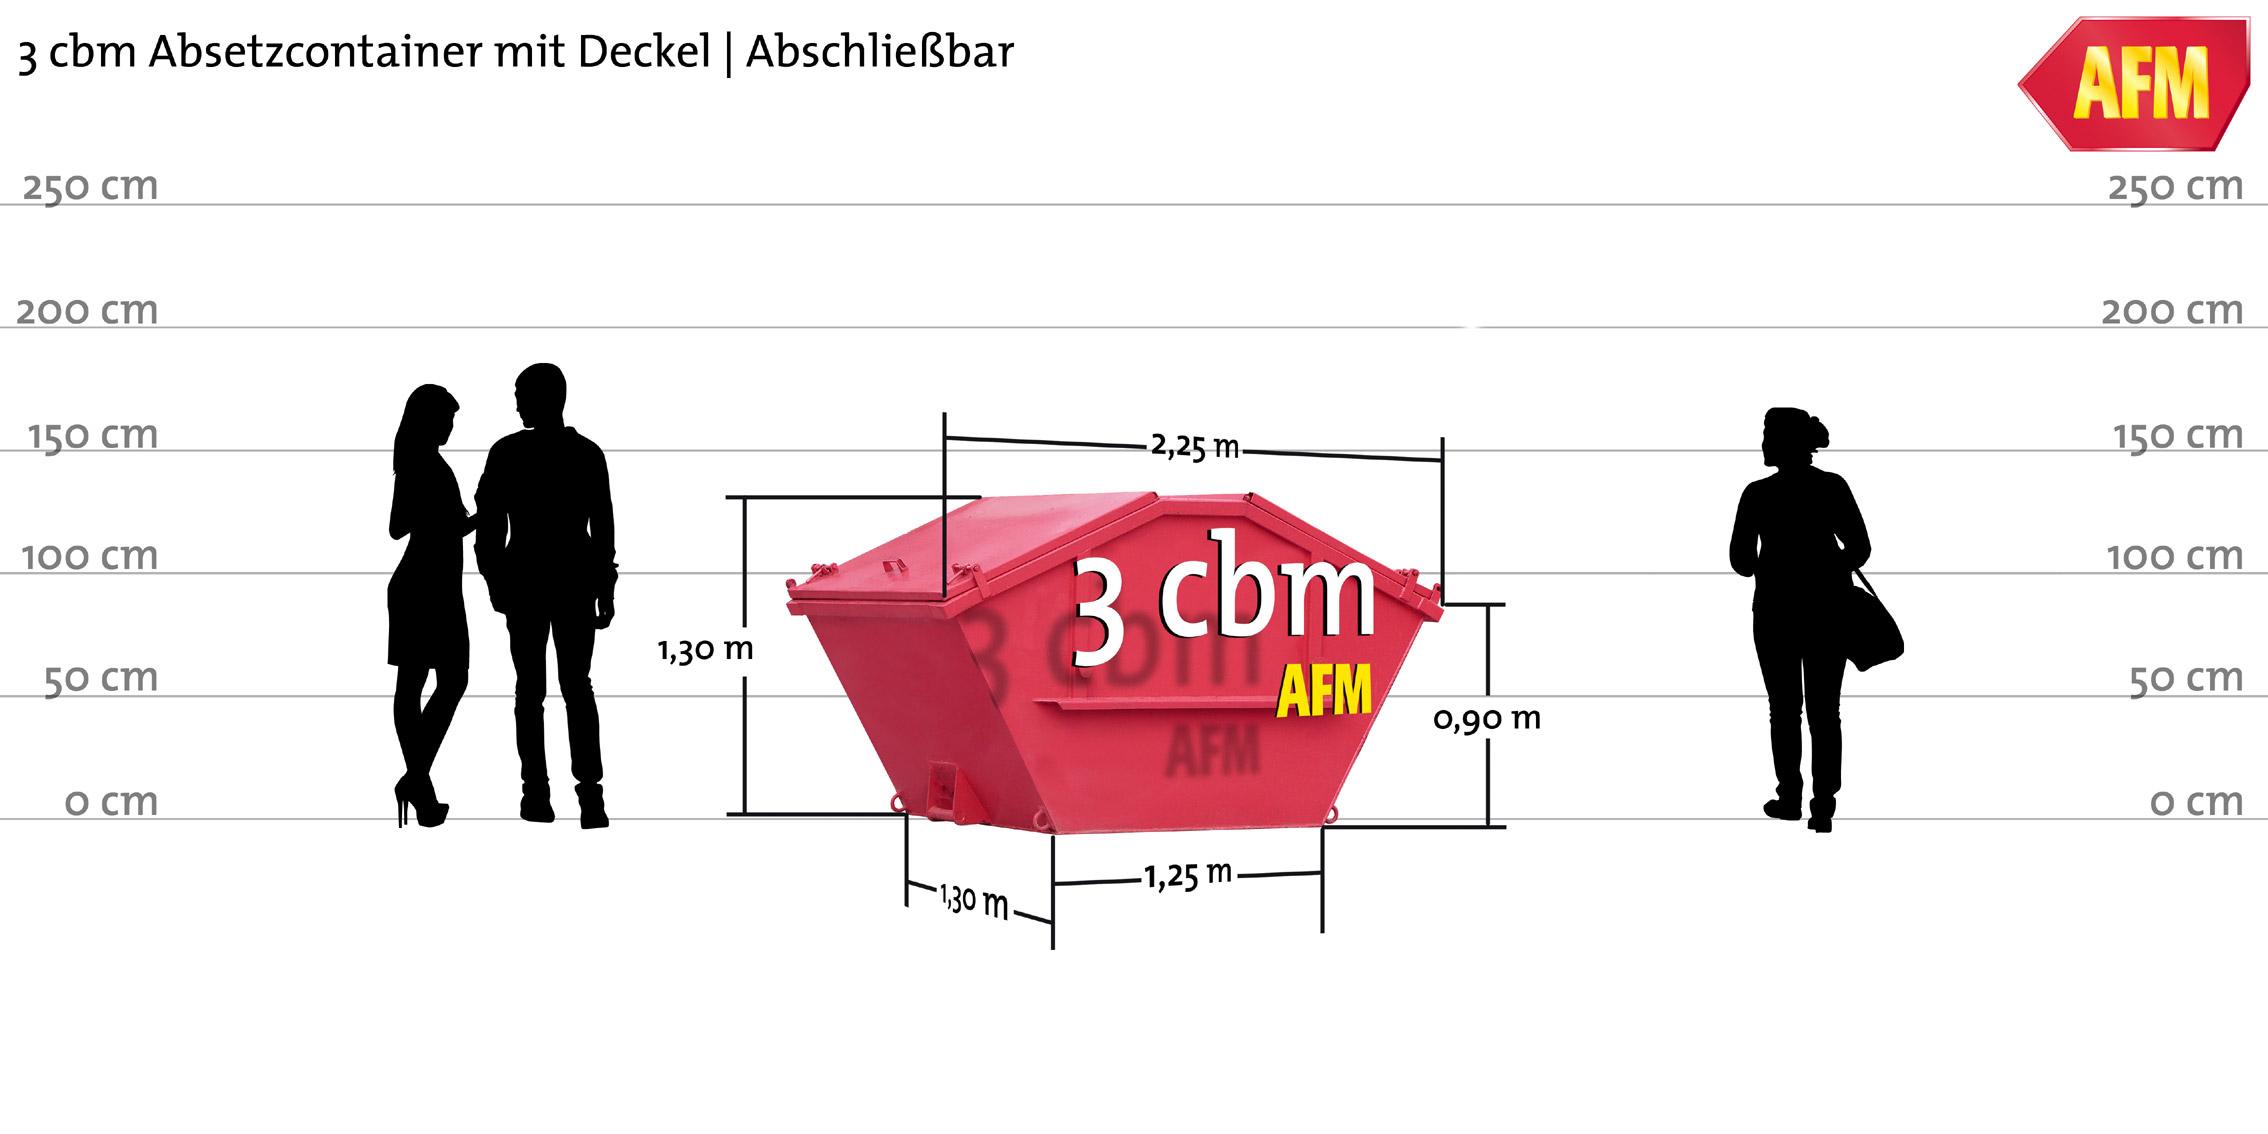 bauschutt entsorgen m nchen absetzcontainer 3 cbm preise. Black Bedroom Furniture Sets. Home Design Ideas